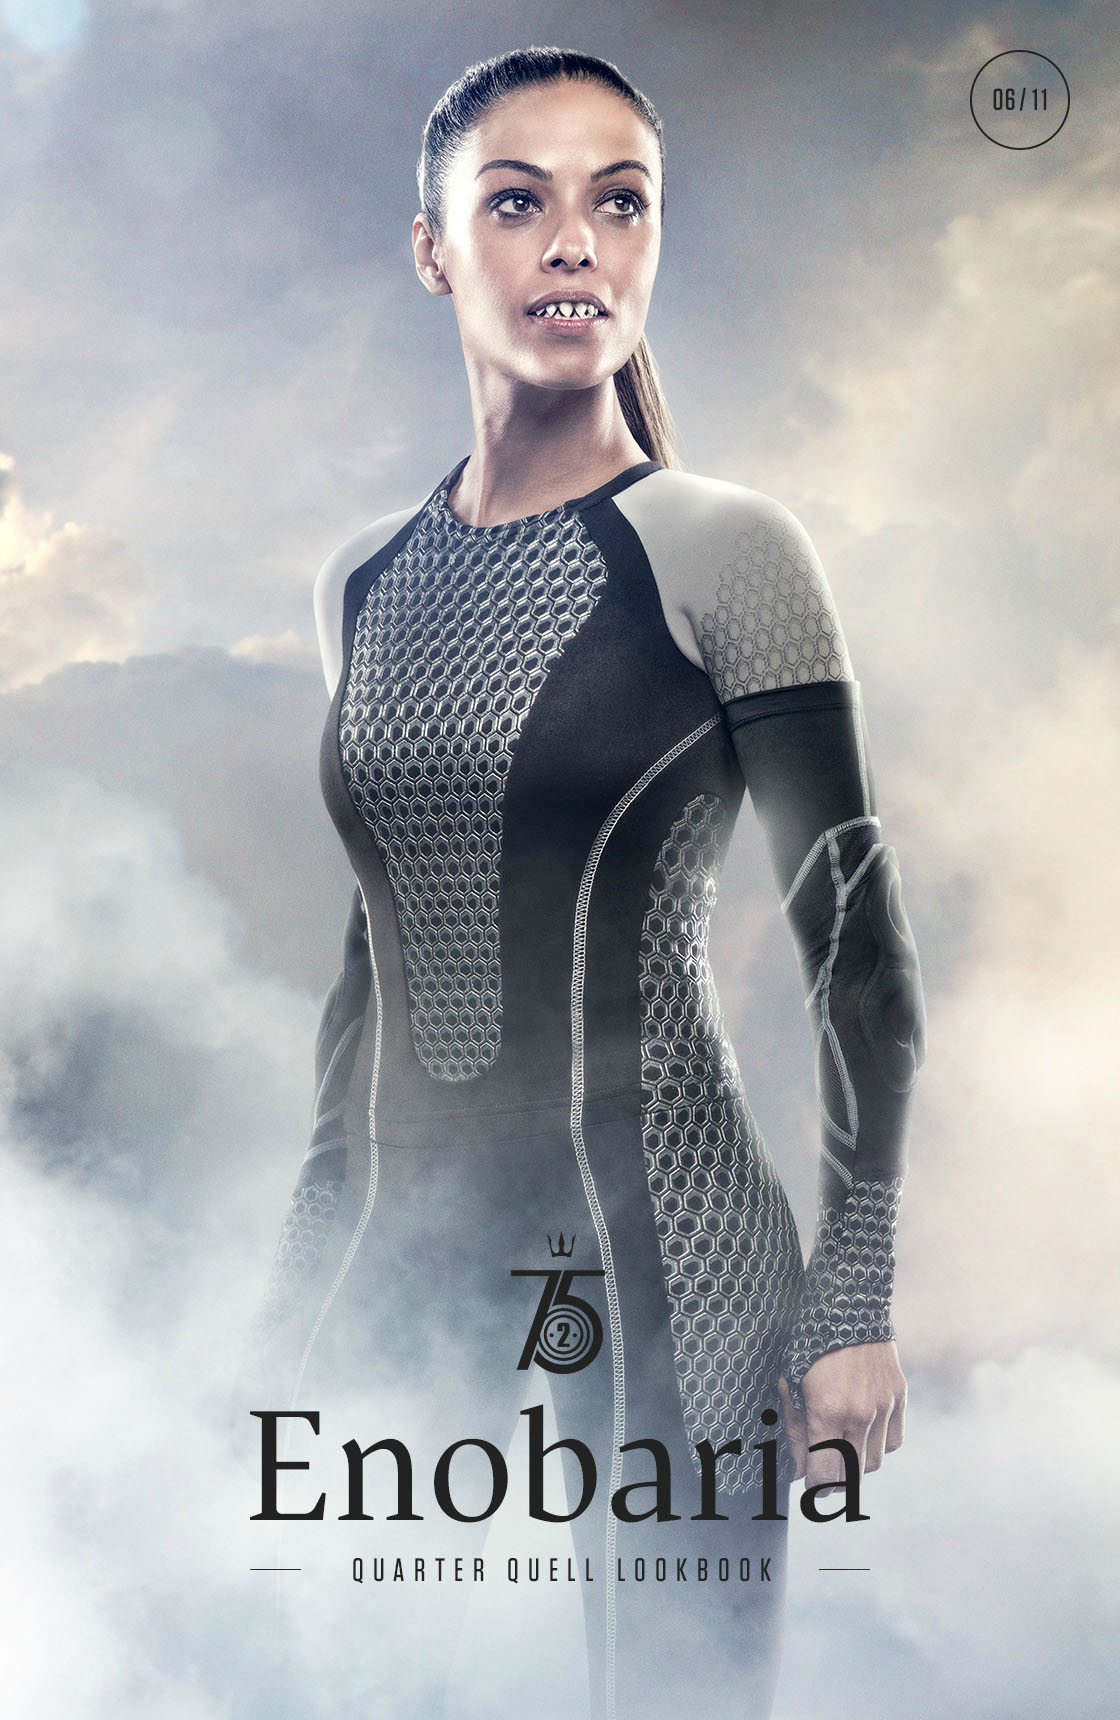 Enobaria Hunger Games Quarter quell enobaria